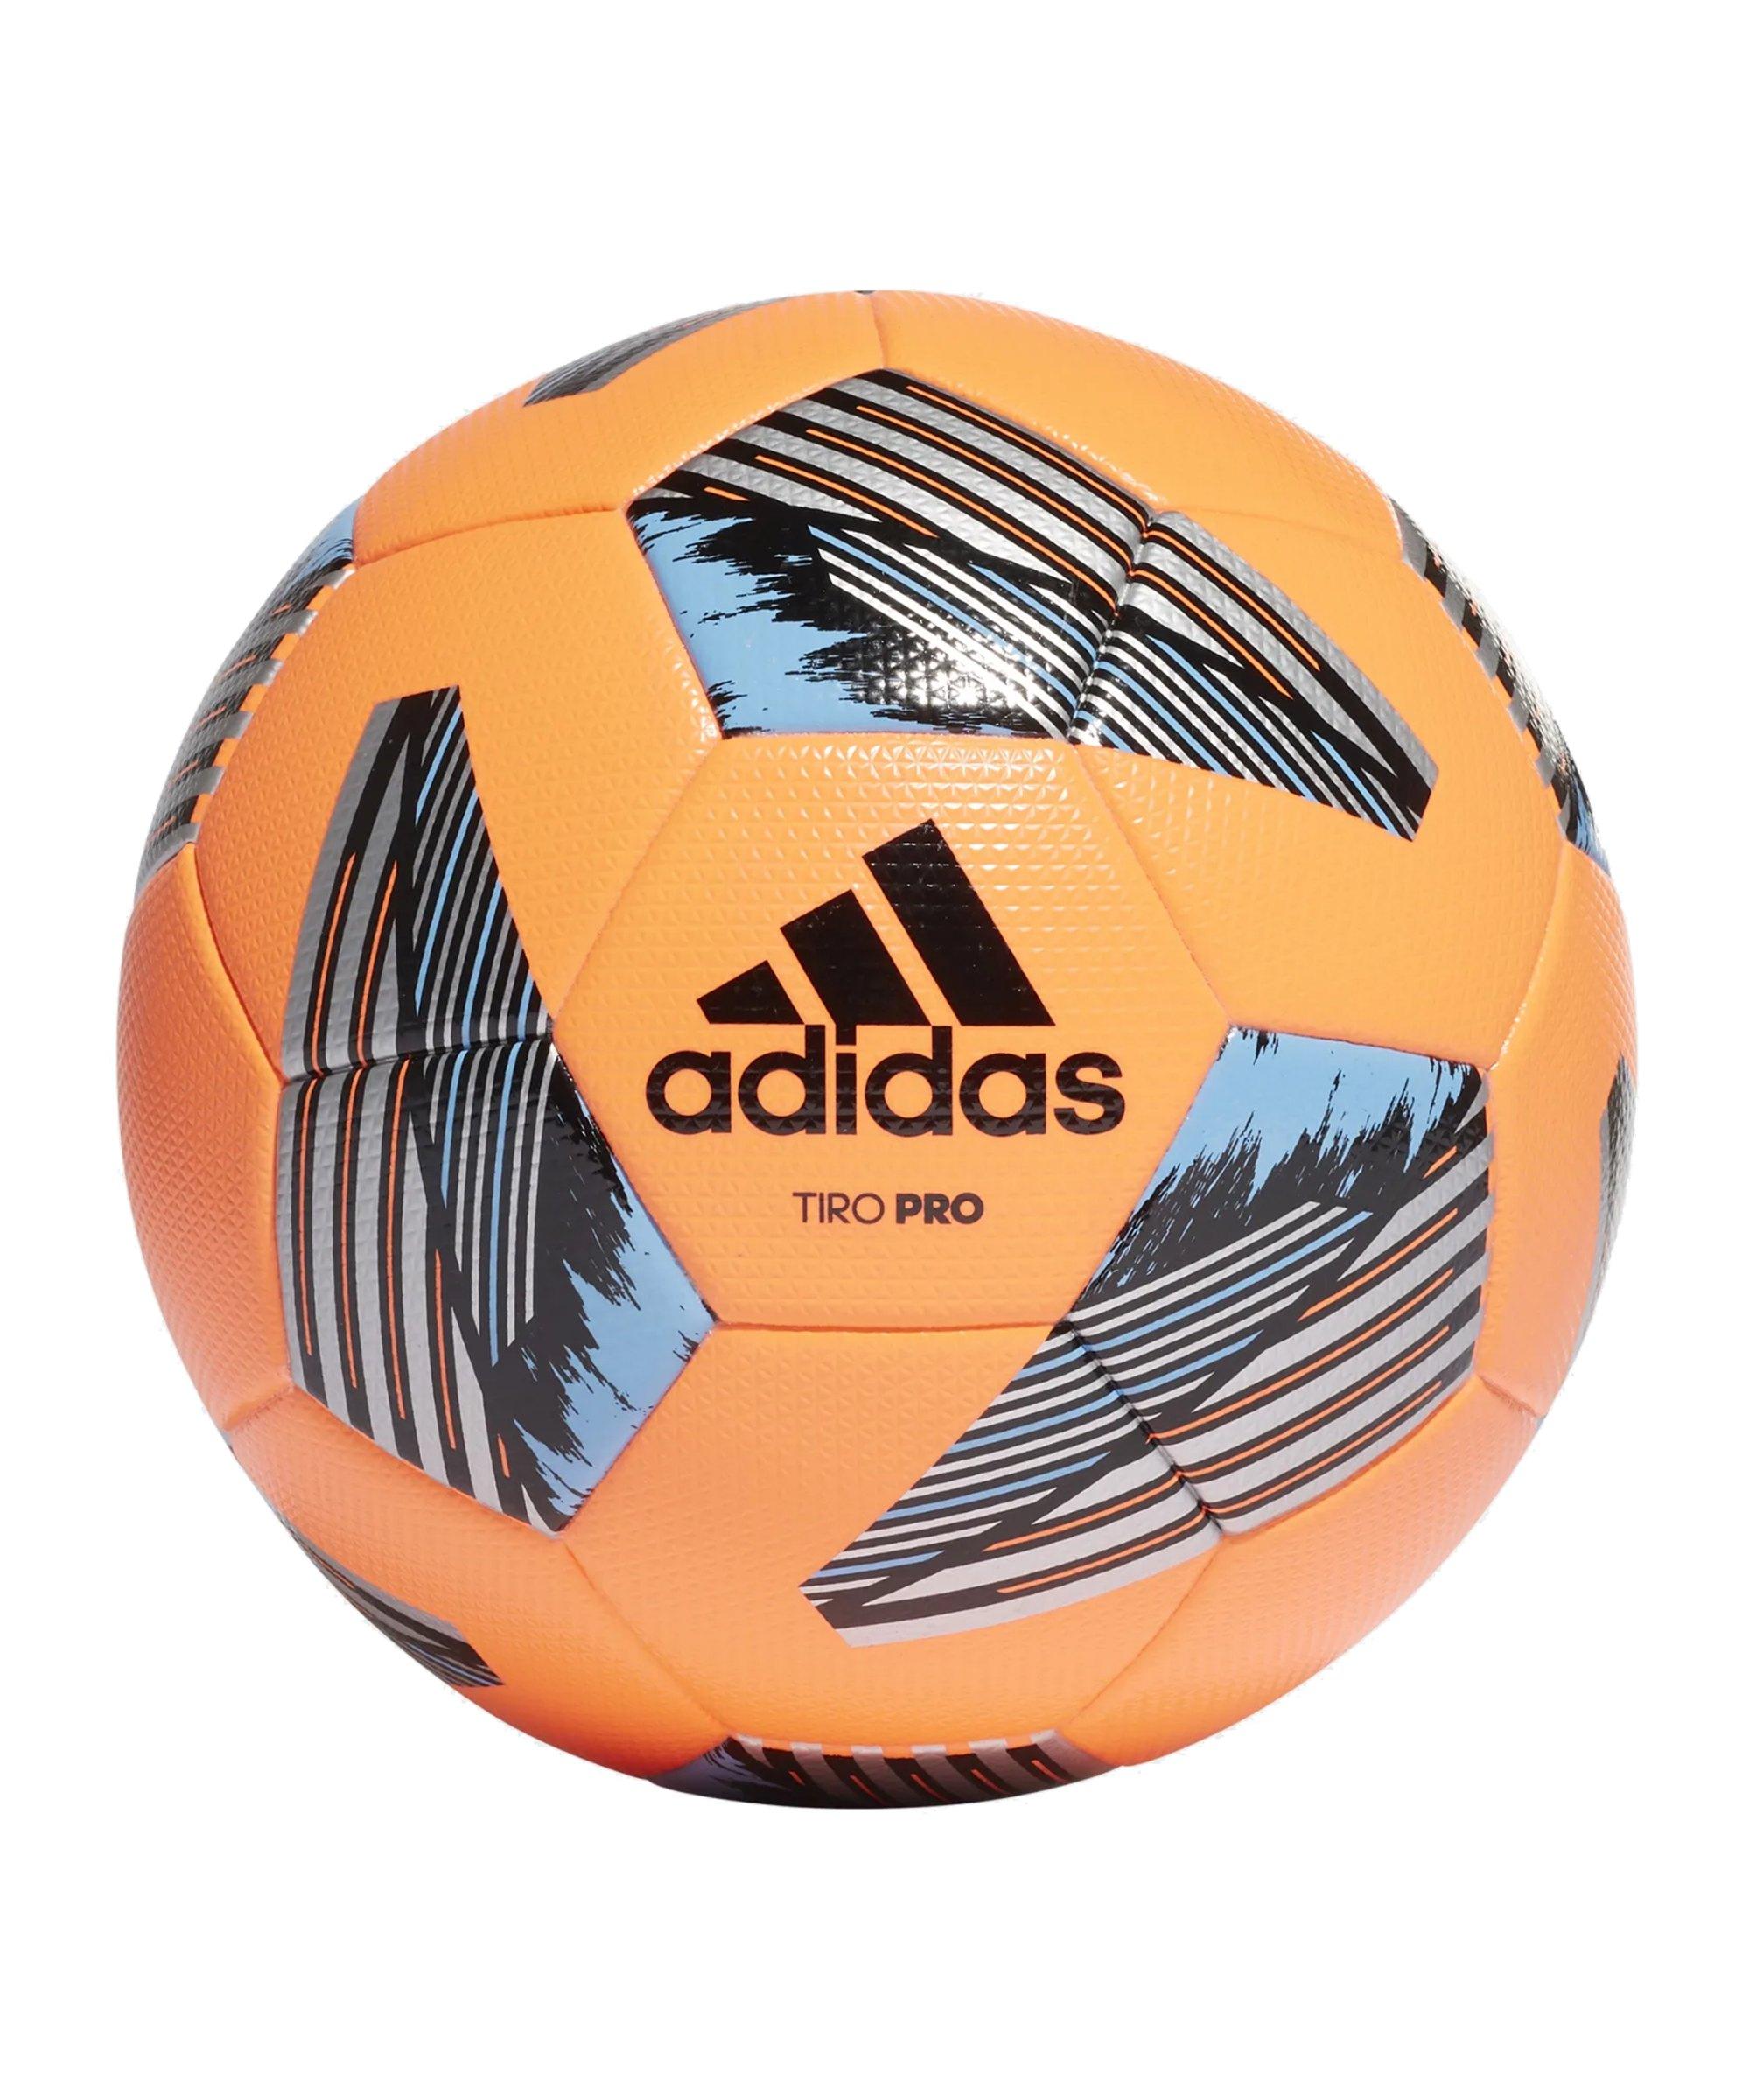 adidas Tiro Pro Winter Spielball Orange - orange